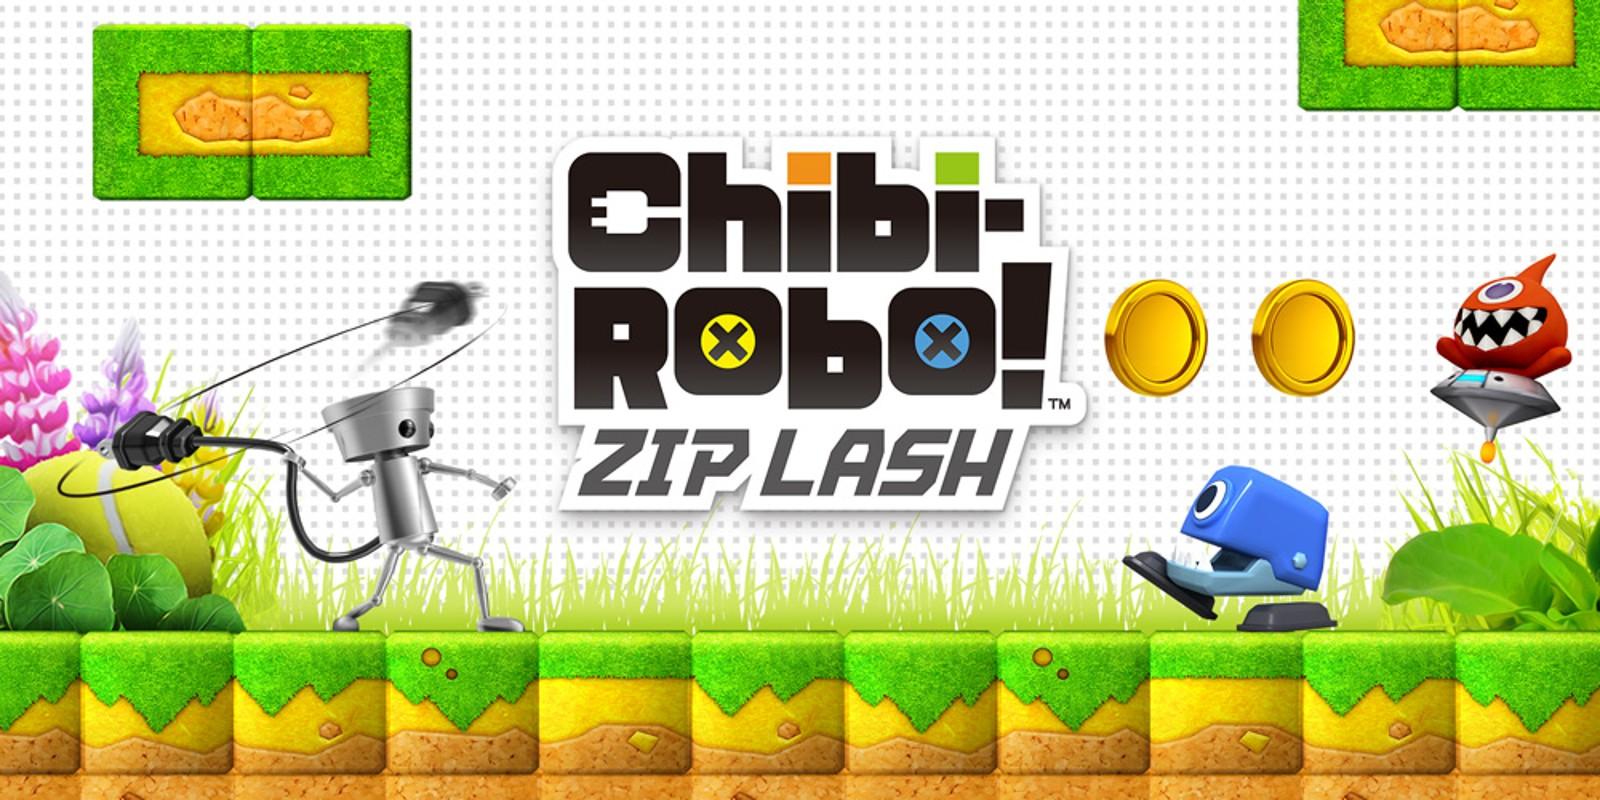 chibi robo wallpaper.html